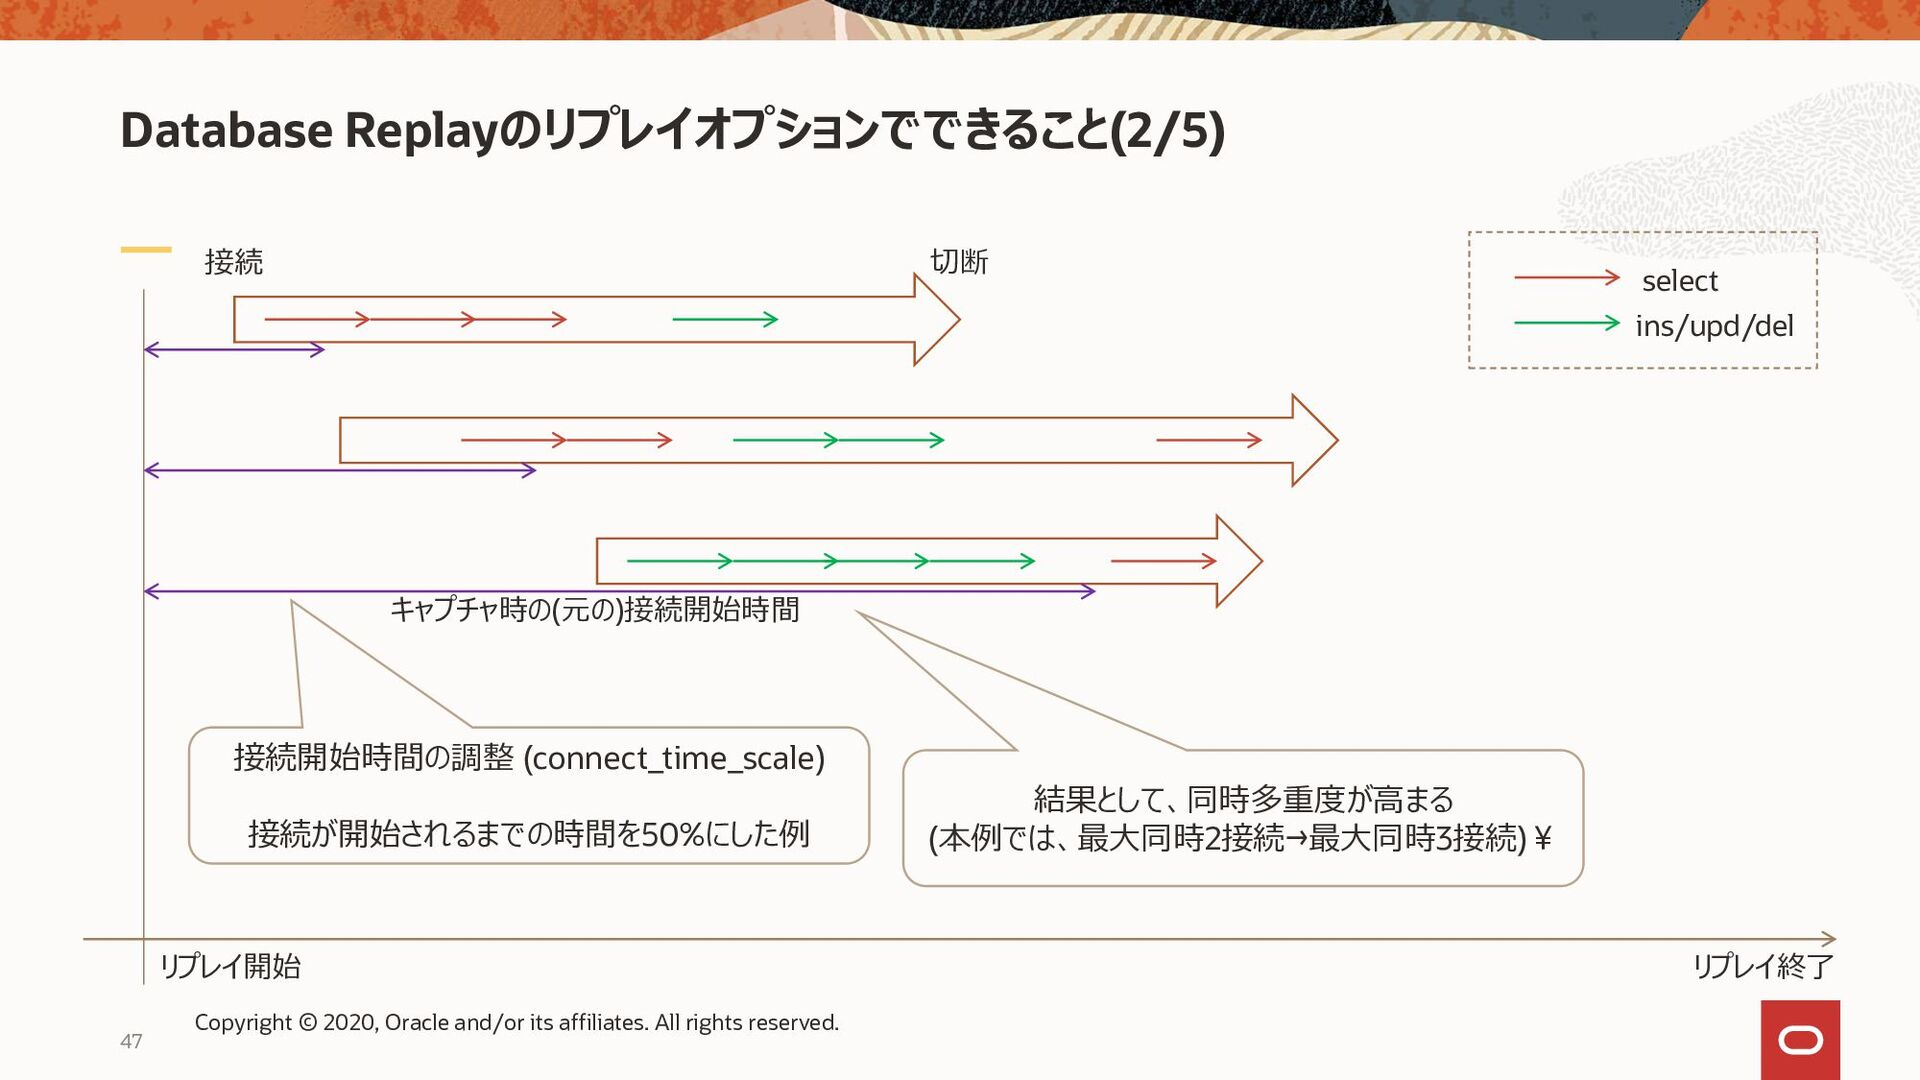 Database Replayのリプレイオプションでできること(3/5) 接続 切断 リプレイ...